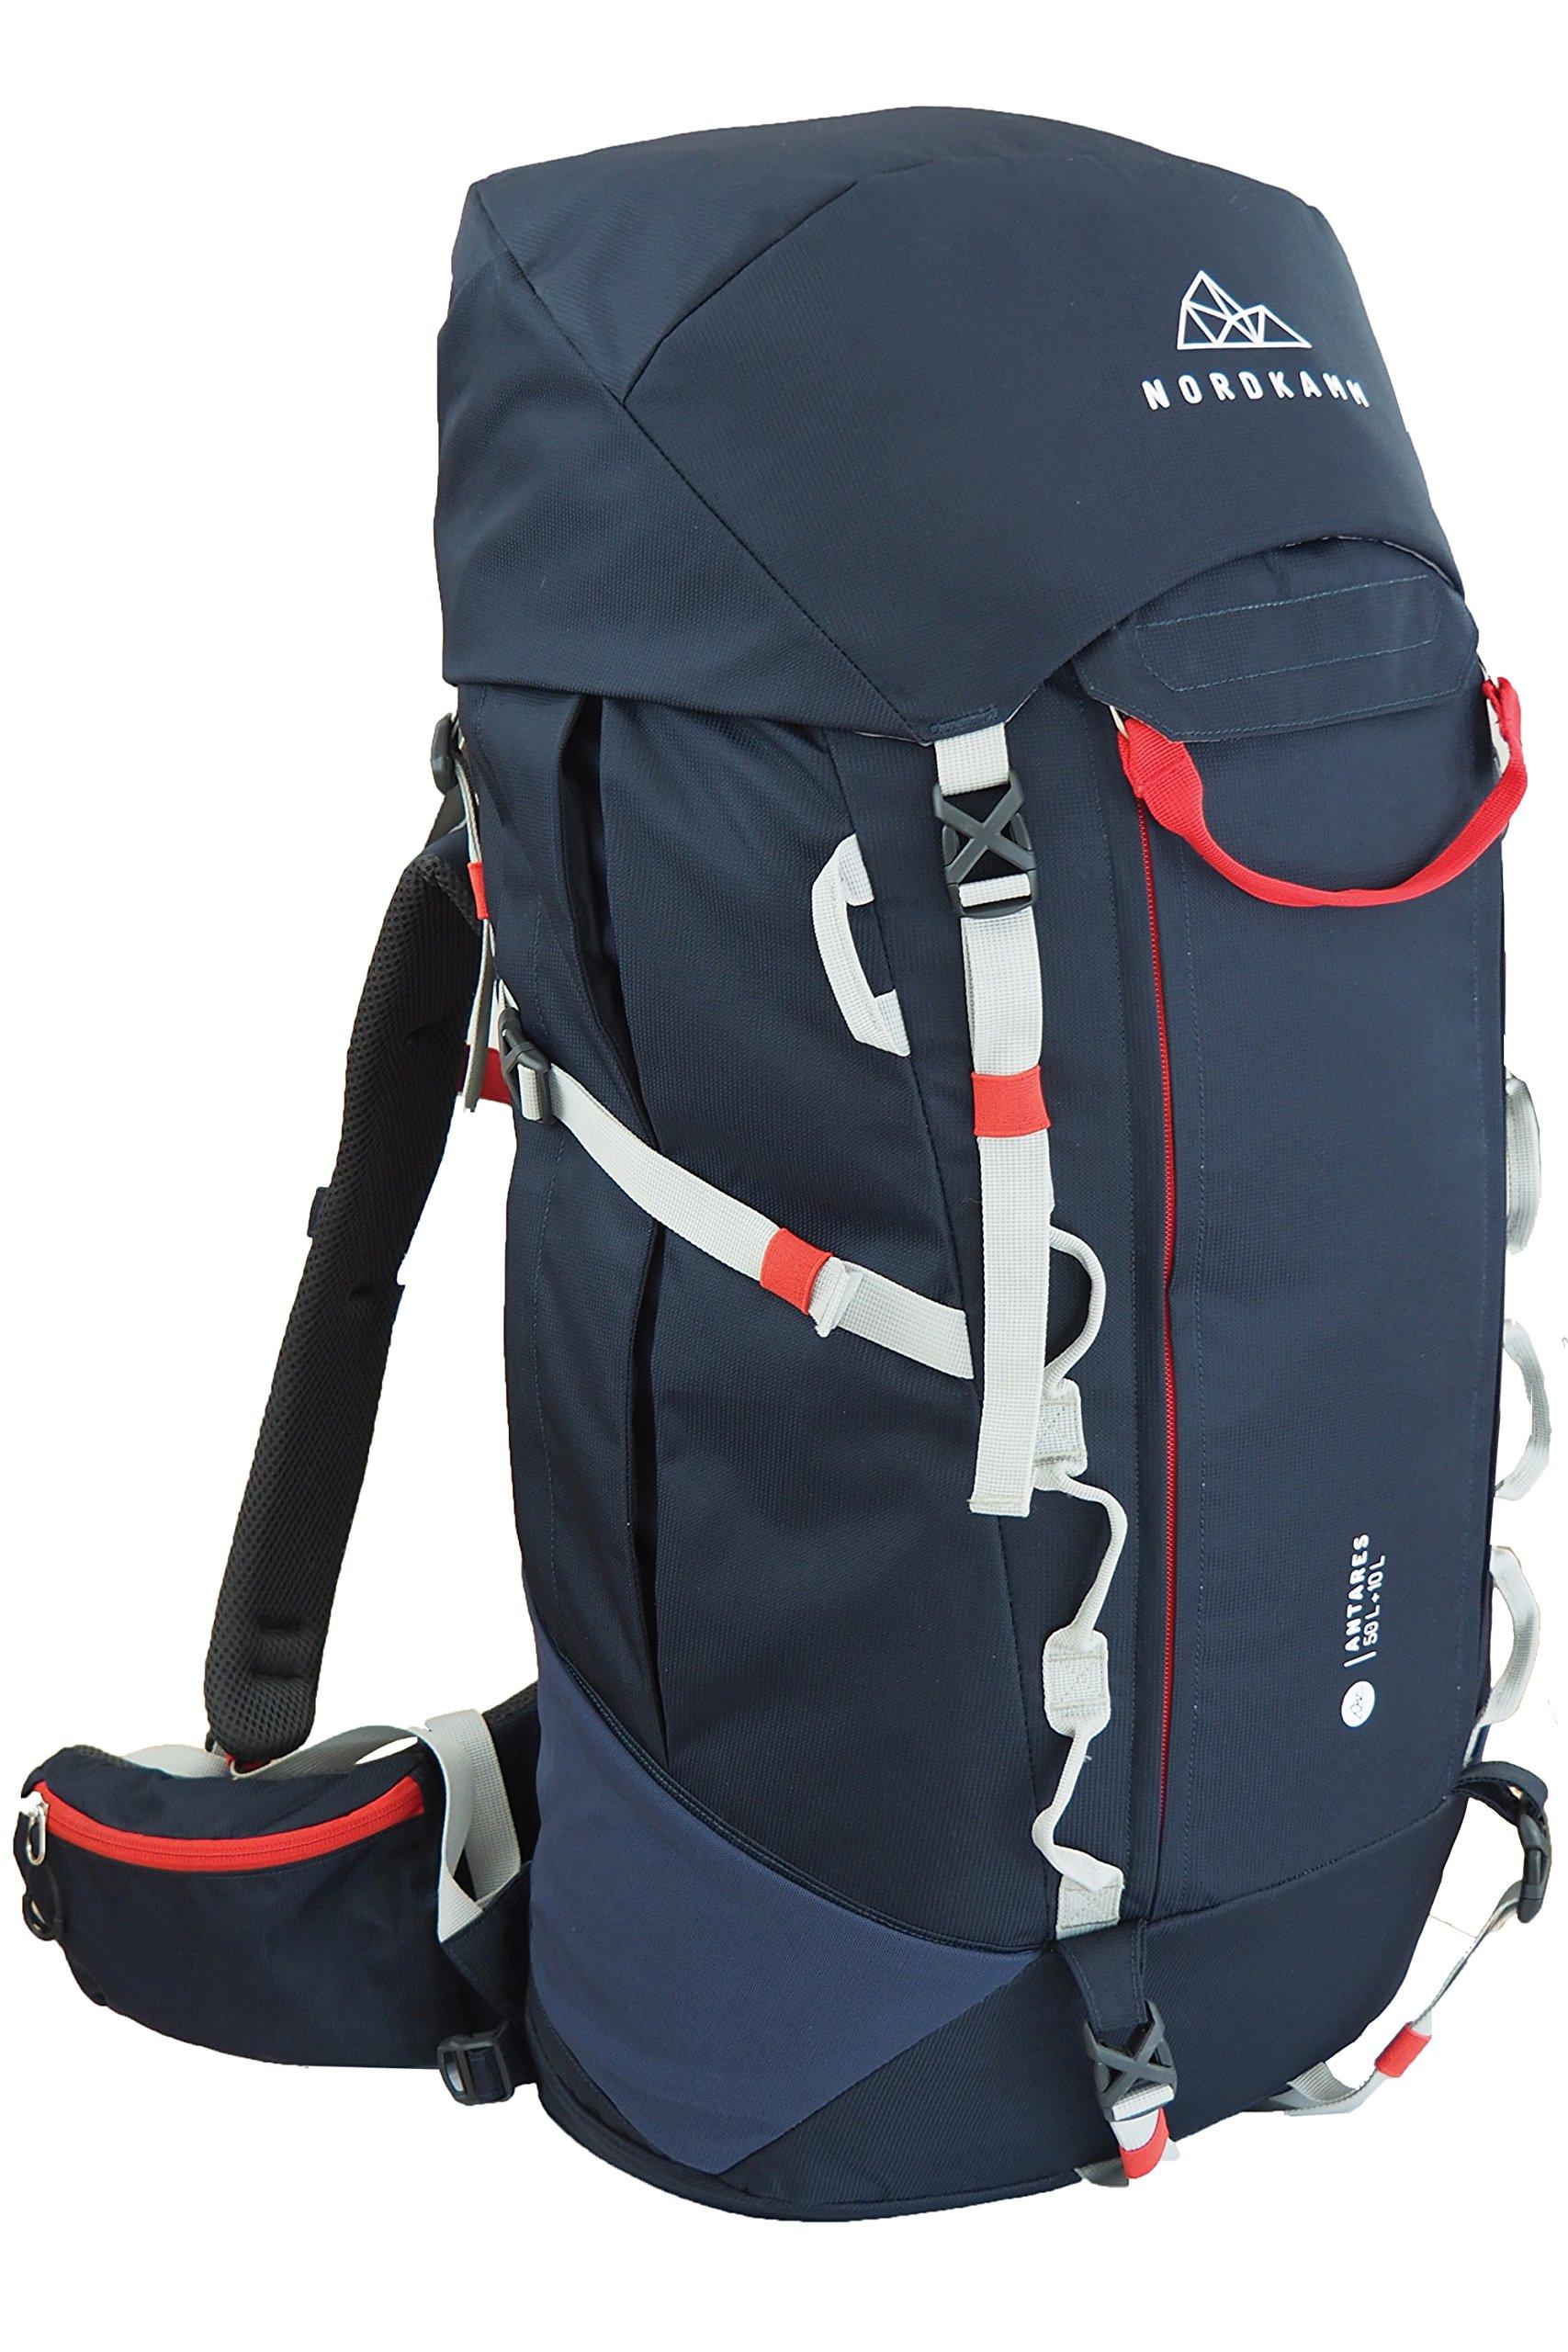 5973042163 NORDKAMM – Zaino 50 l – 60 litri, Zaino da trekking, viaggio, campeggio